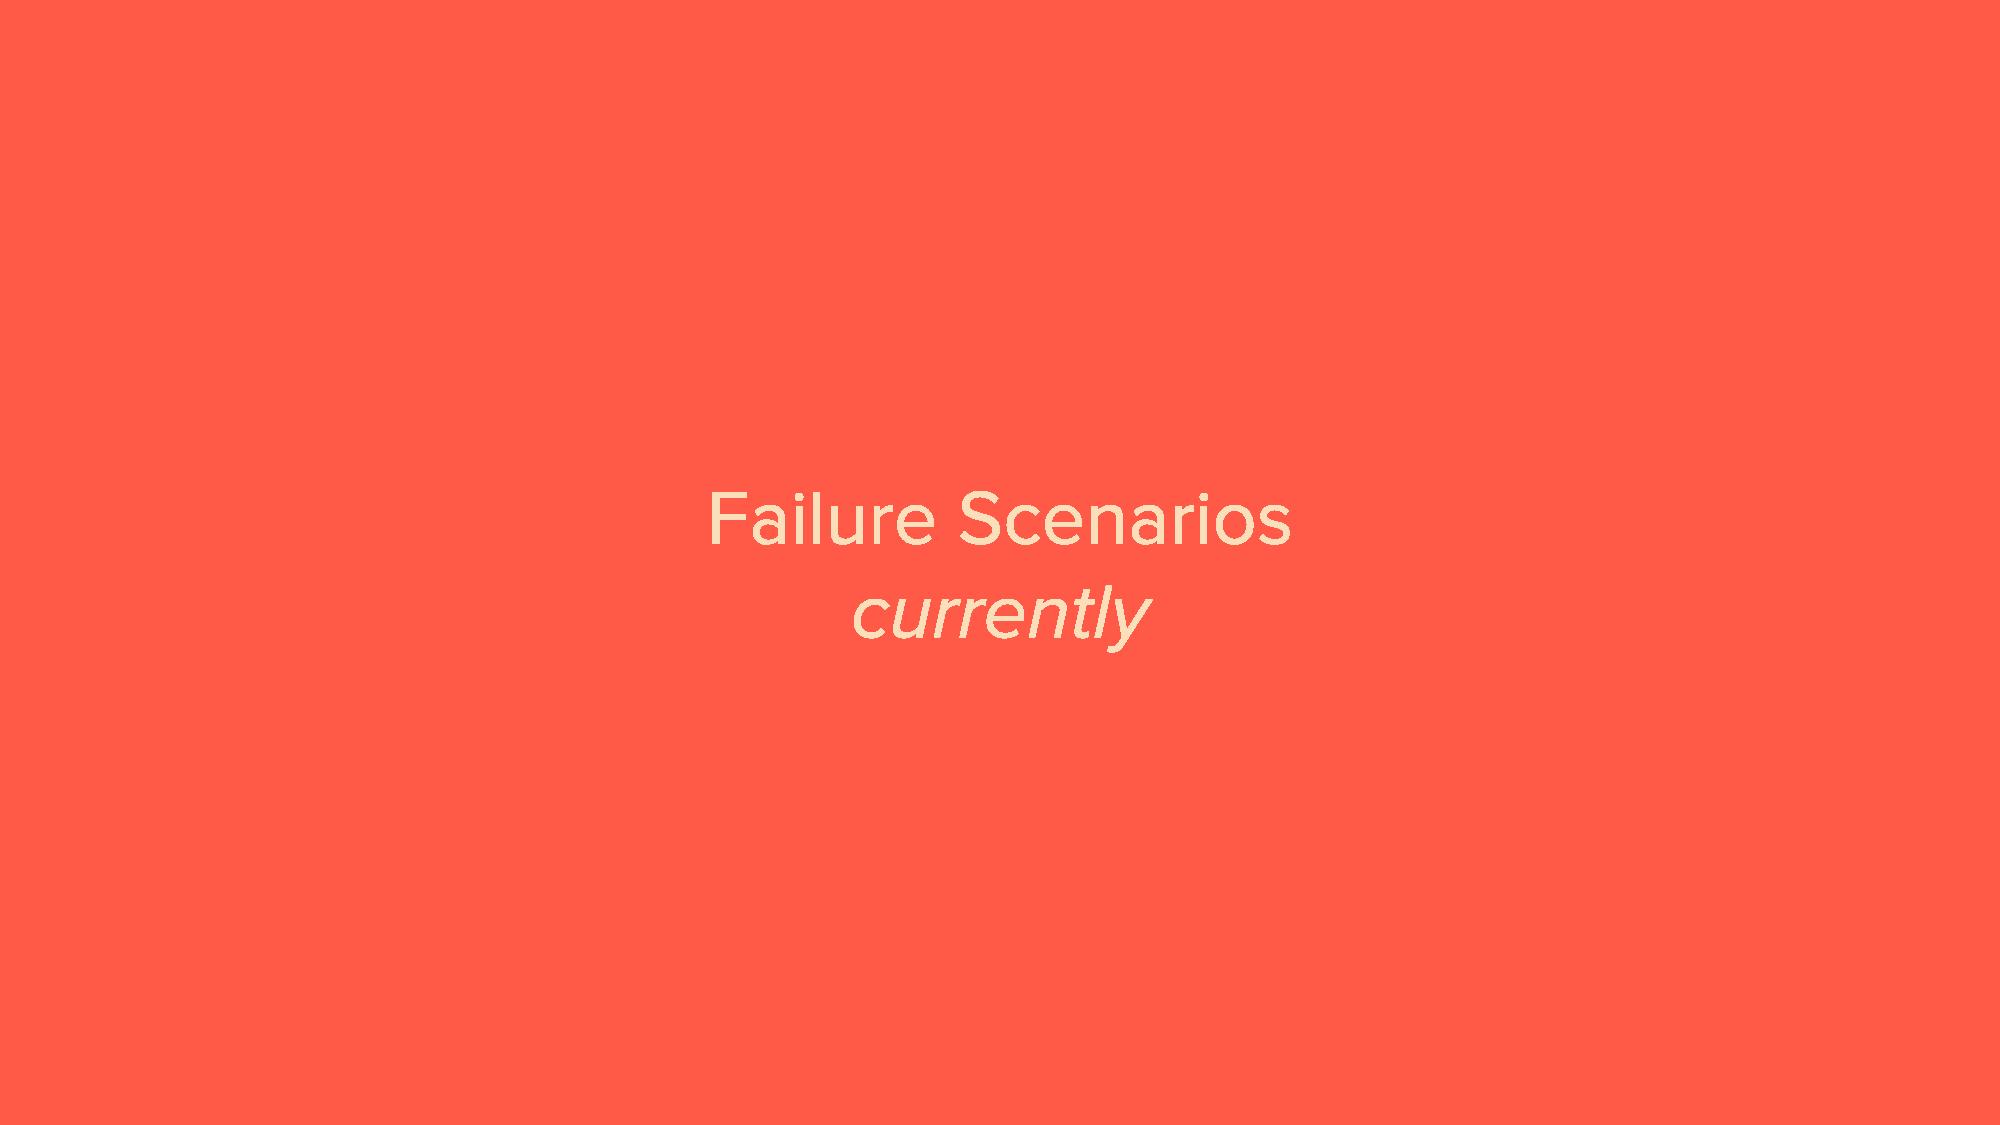 Autocomplete - Failure Scenarios_Page_04.png